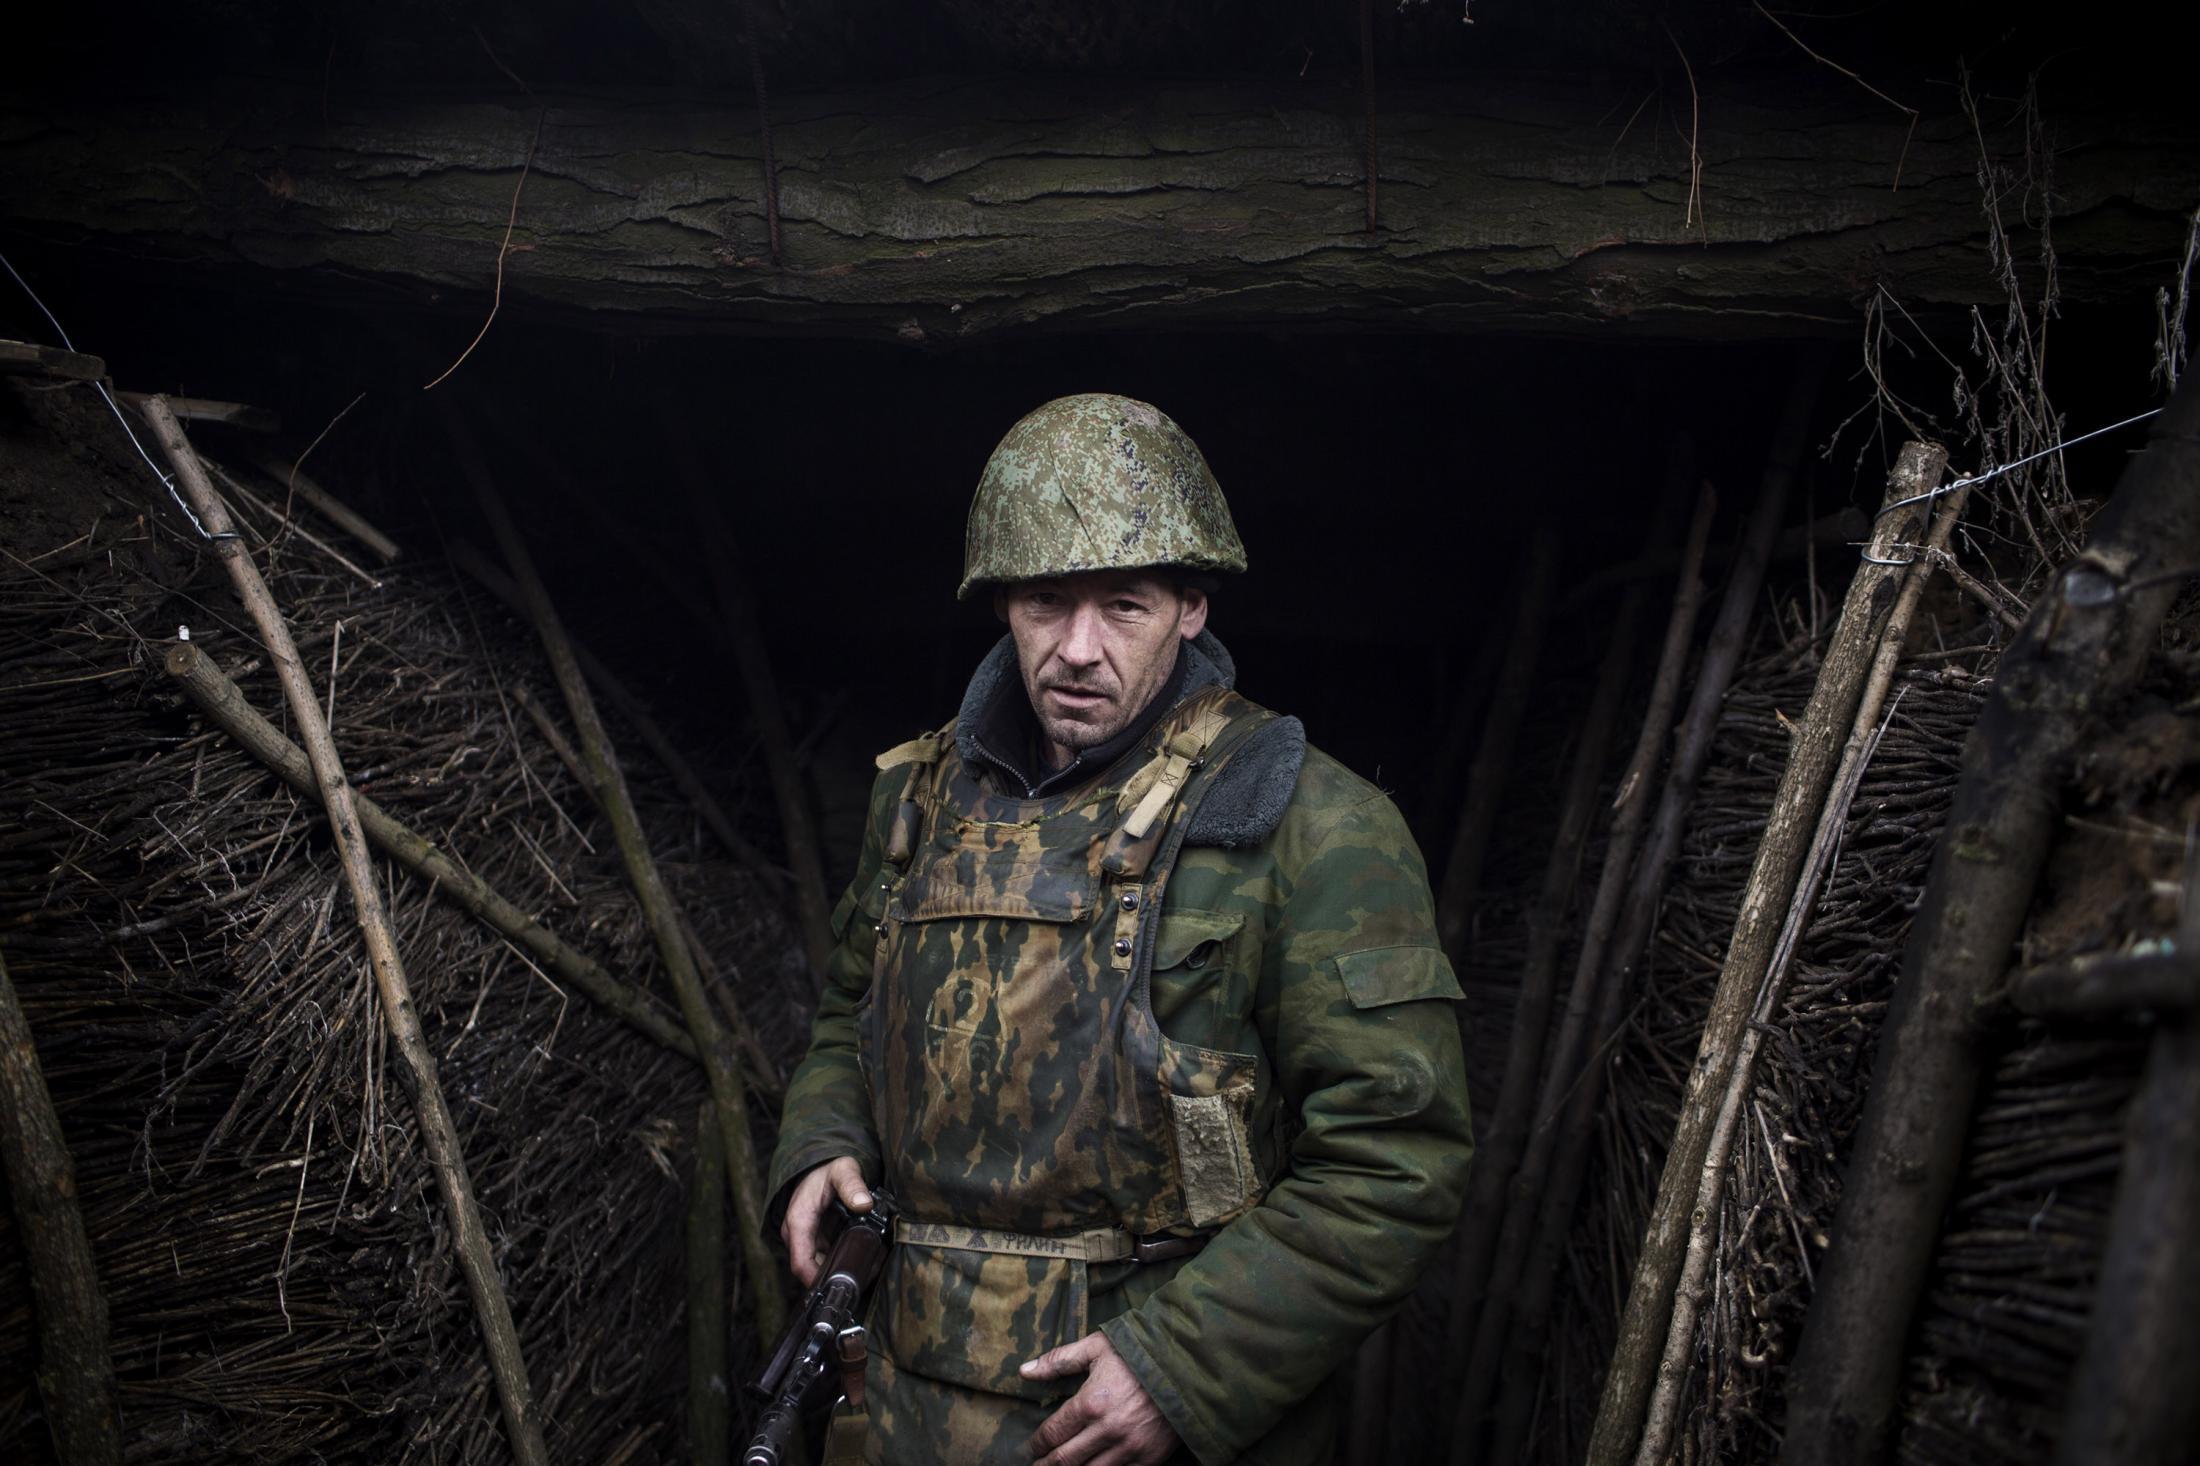 Paths of glory, Donetsk People's Republic 2018.